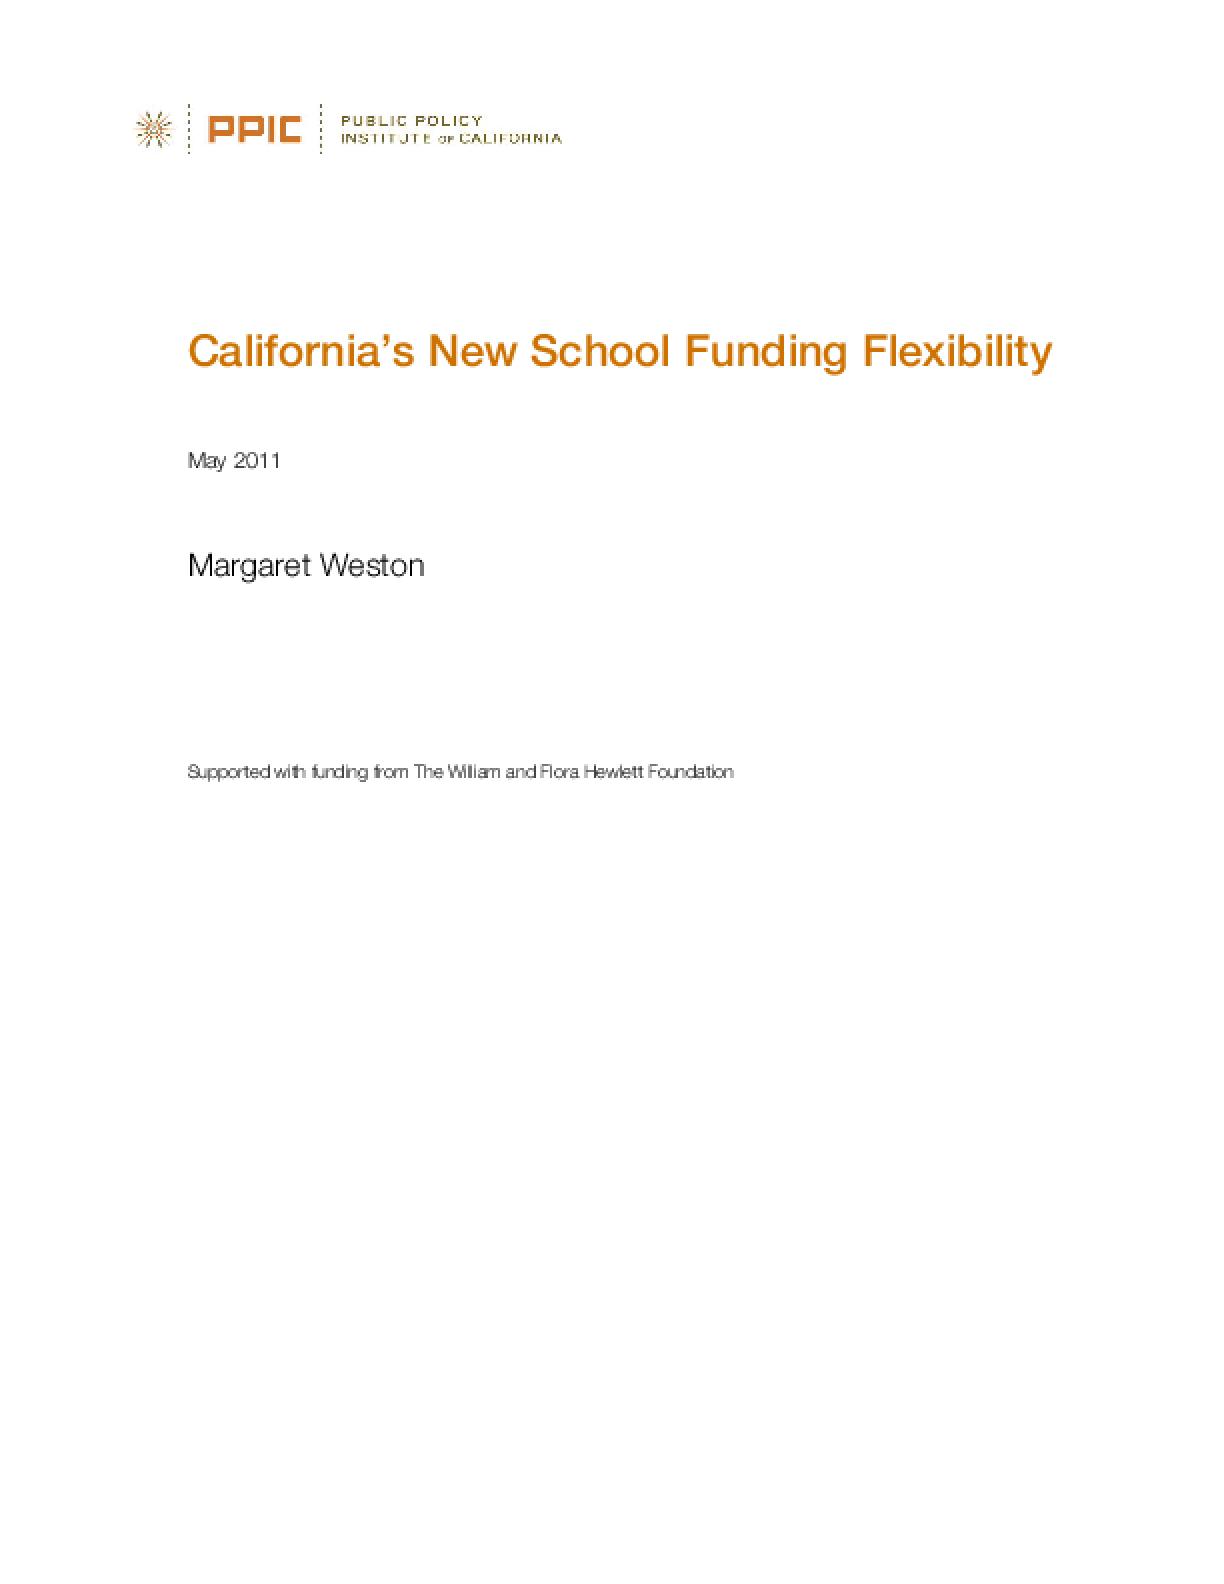 California's New School Funding Flexibility